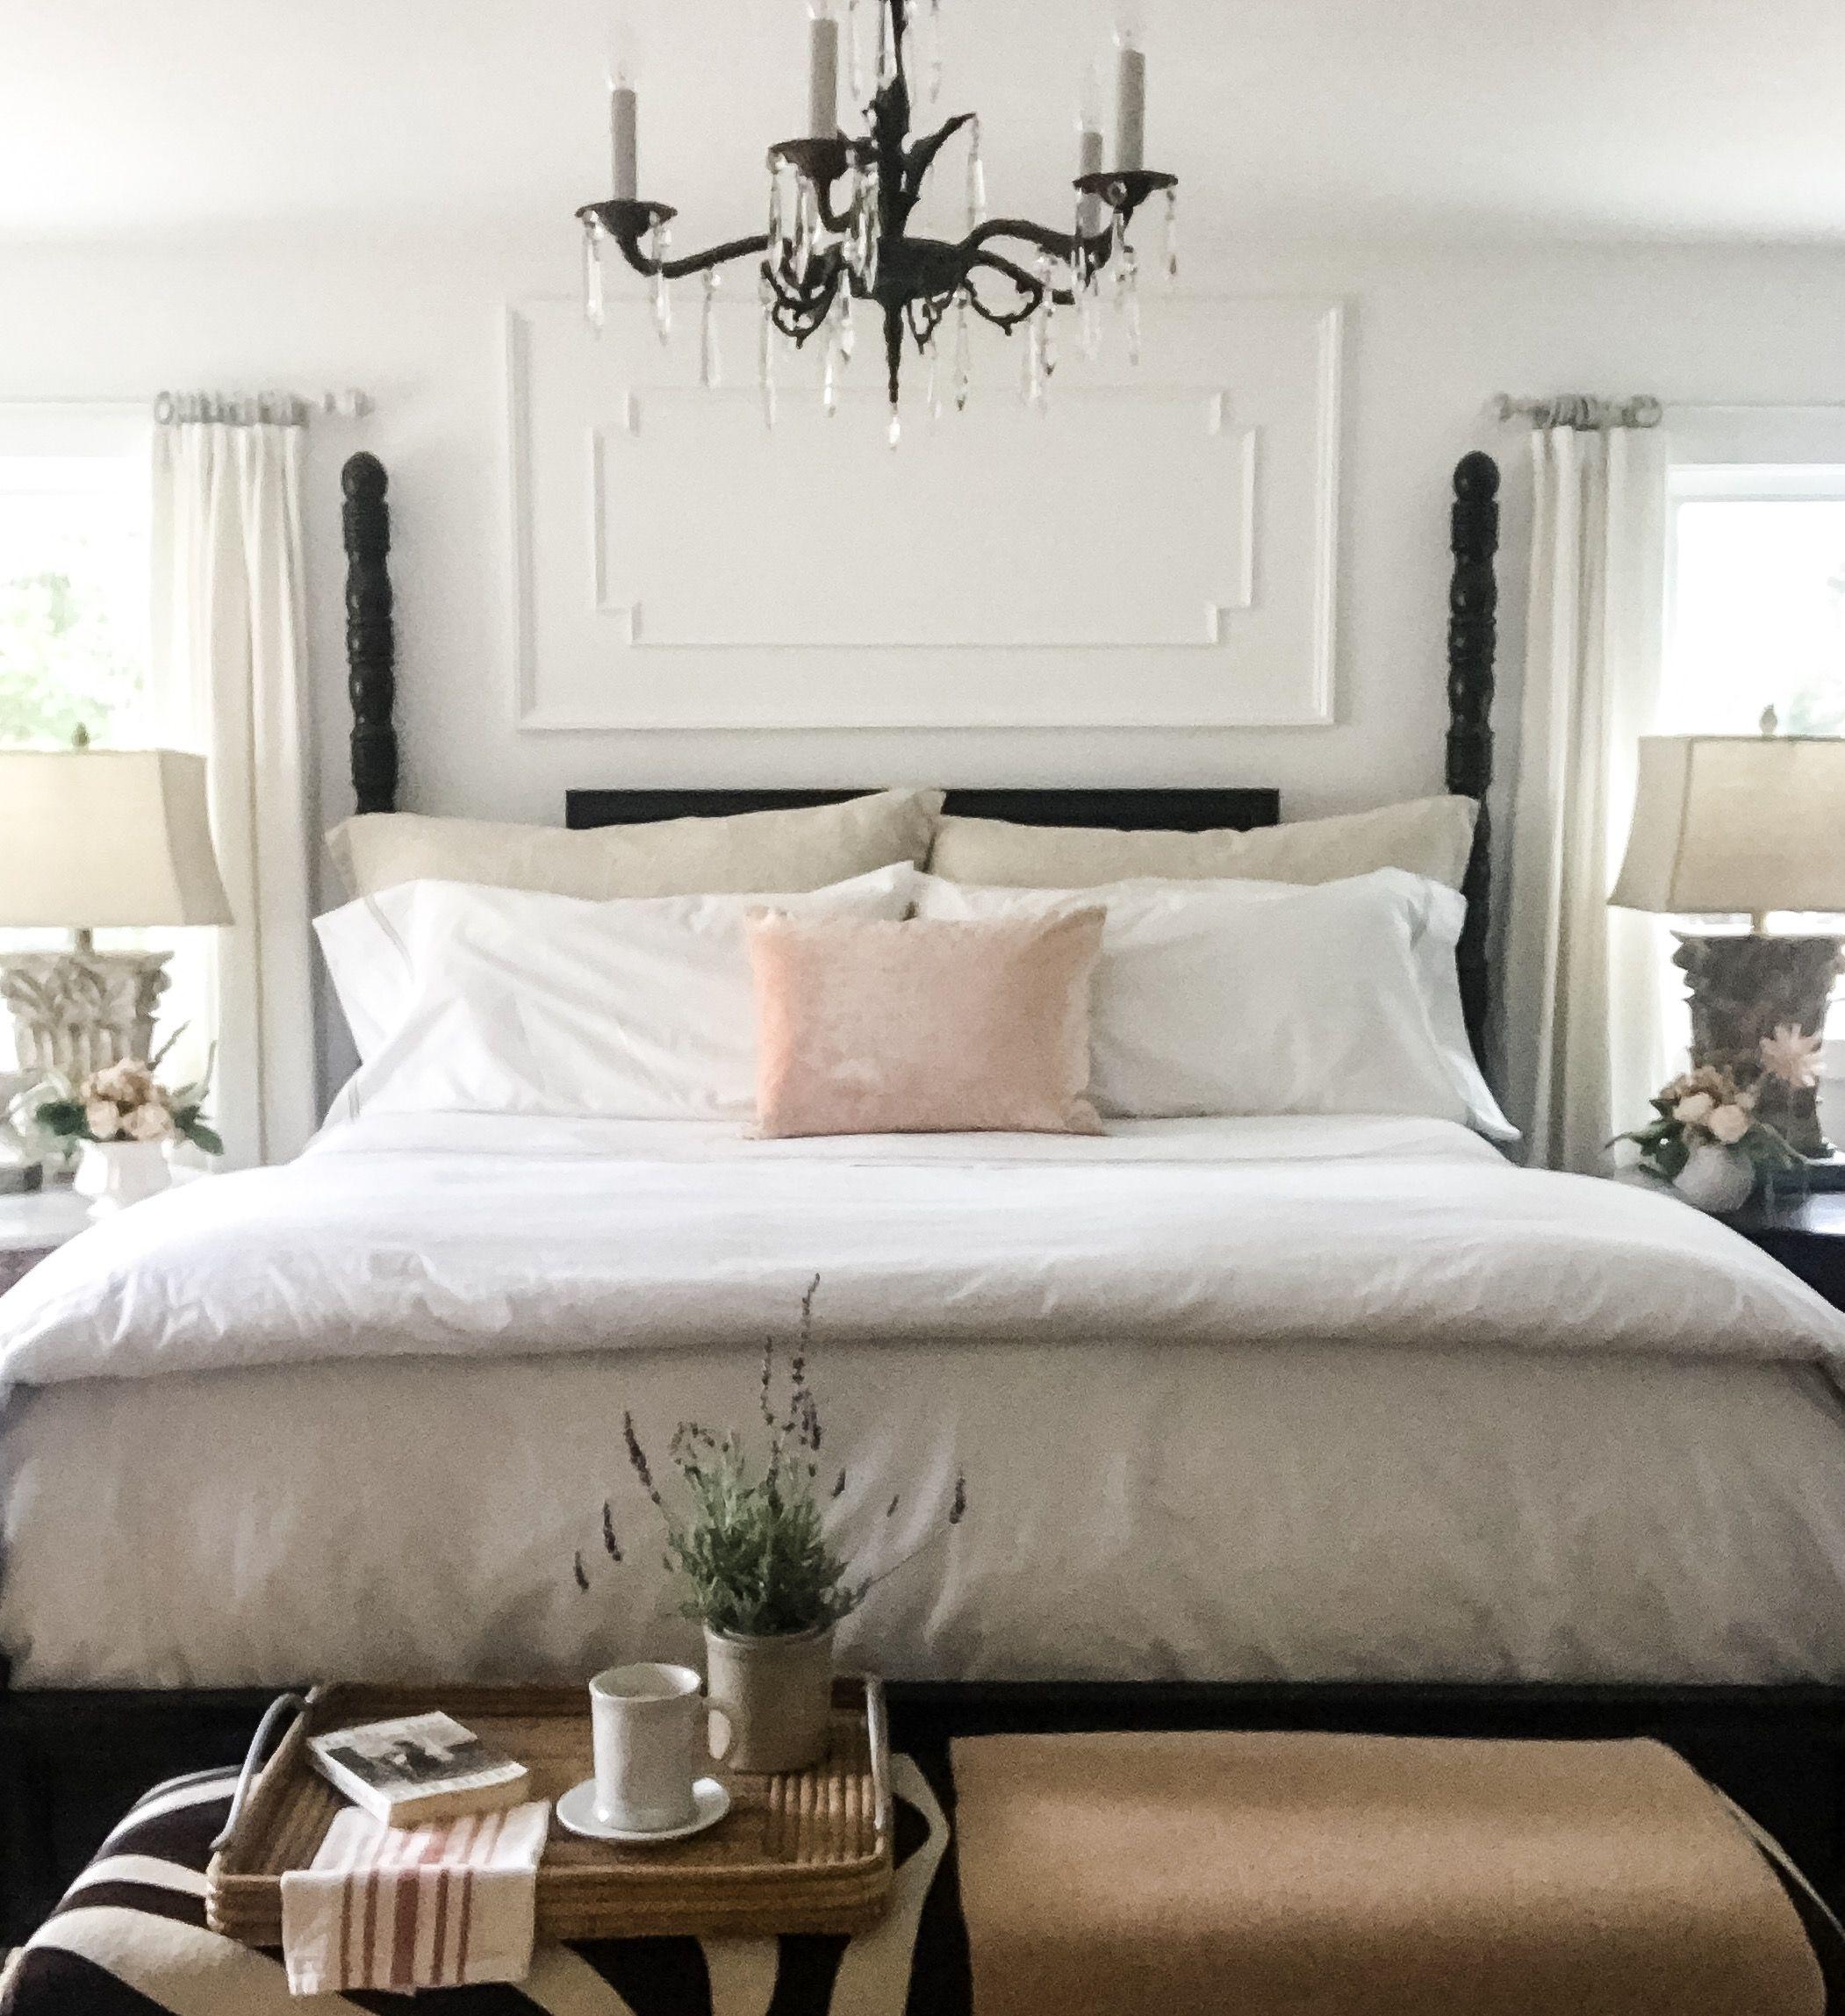 Master Bedroom Renovation Master bedroom renovation